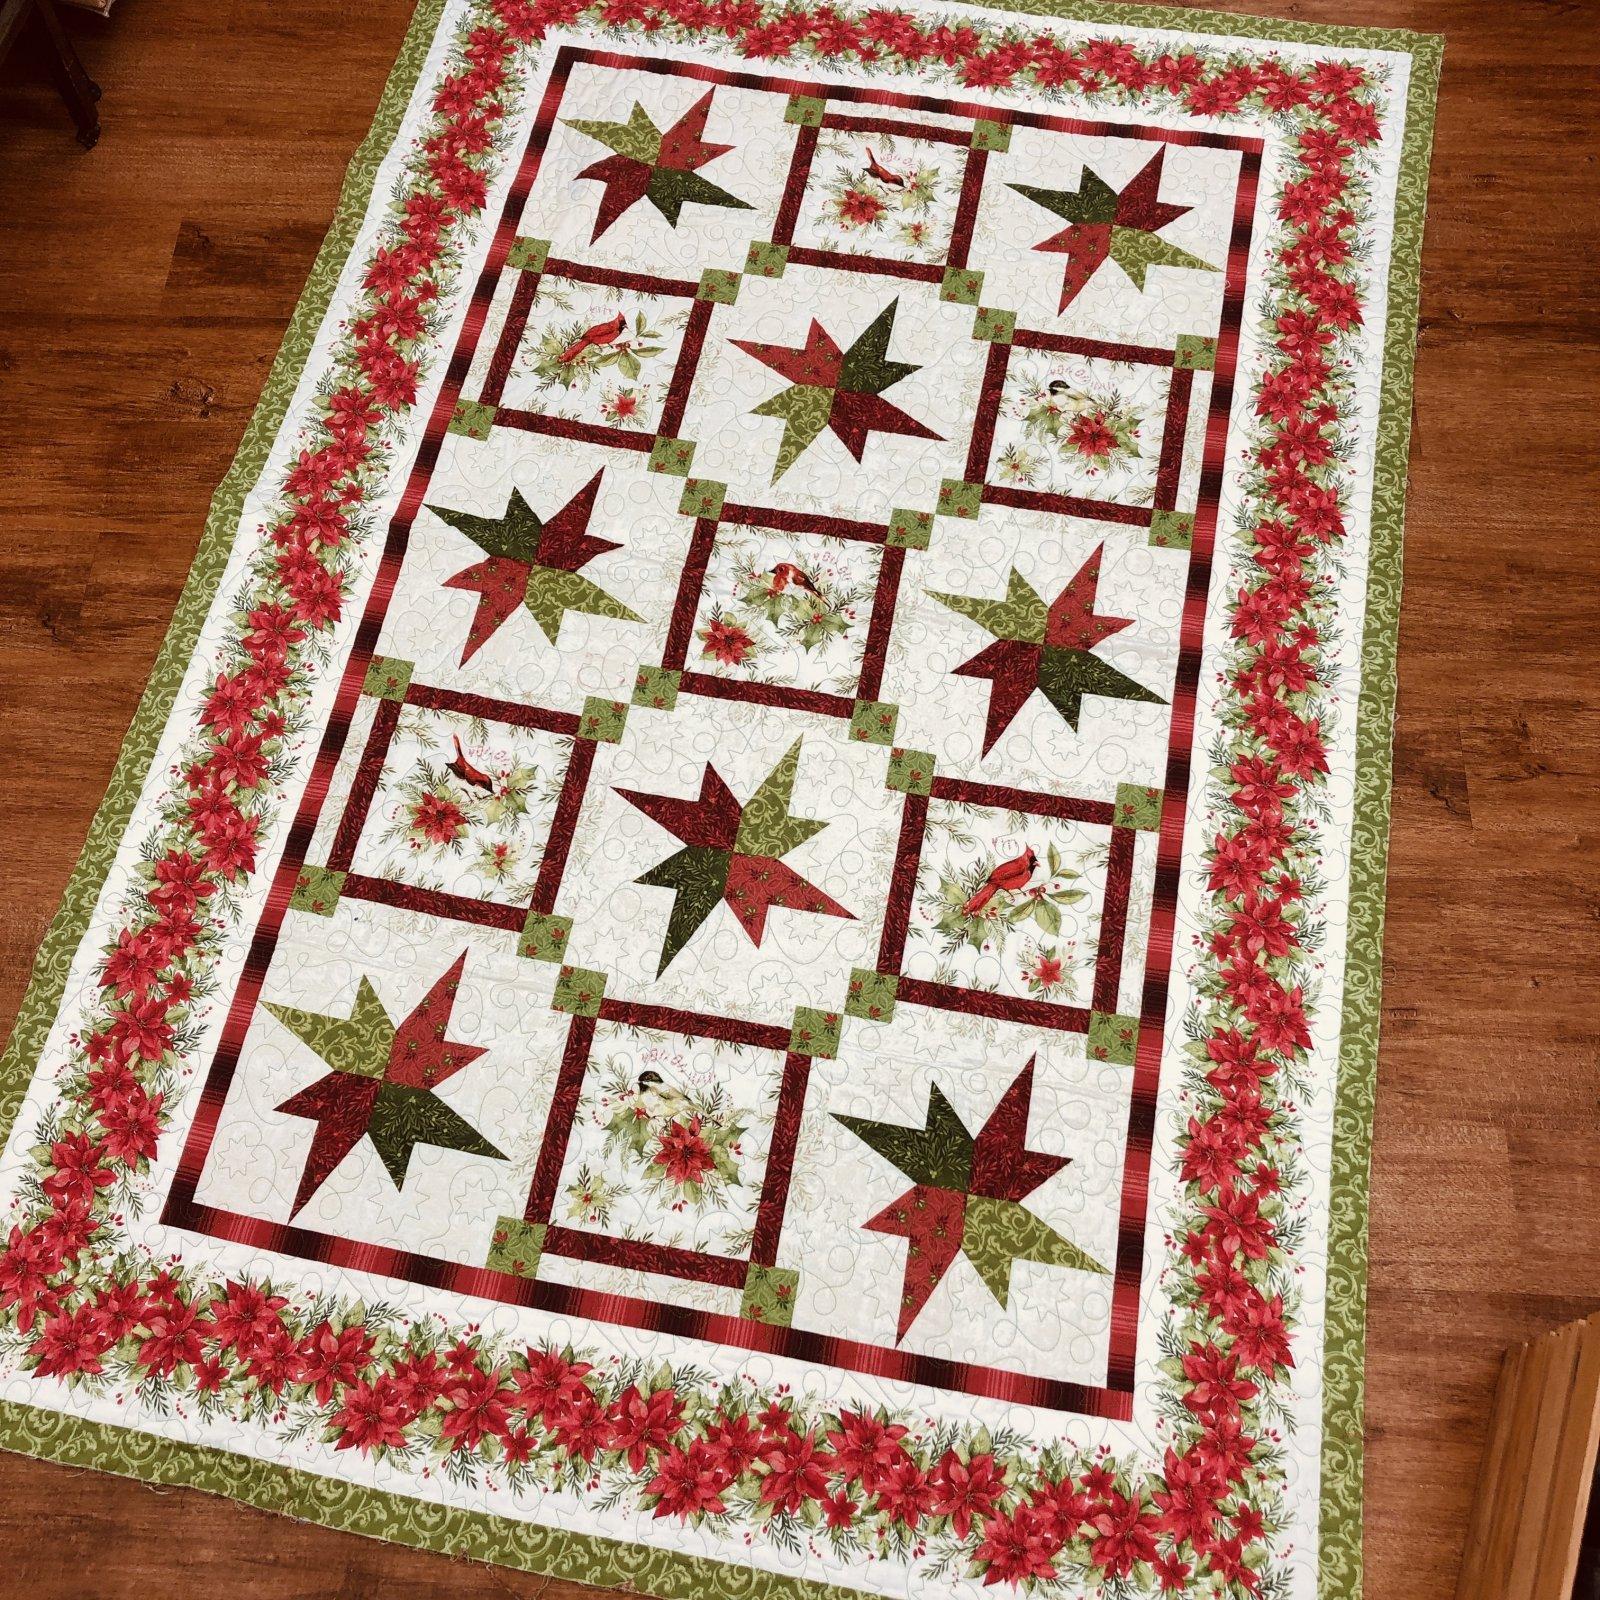 Sample - Christmas Stars Quilt, needs binding